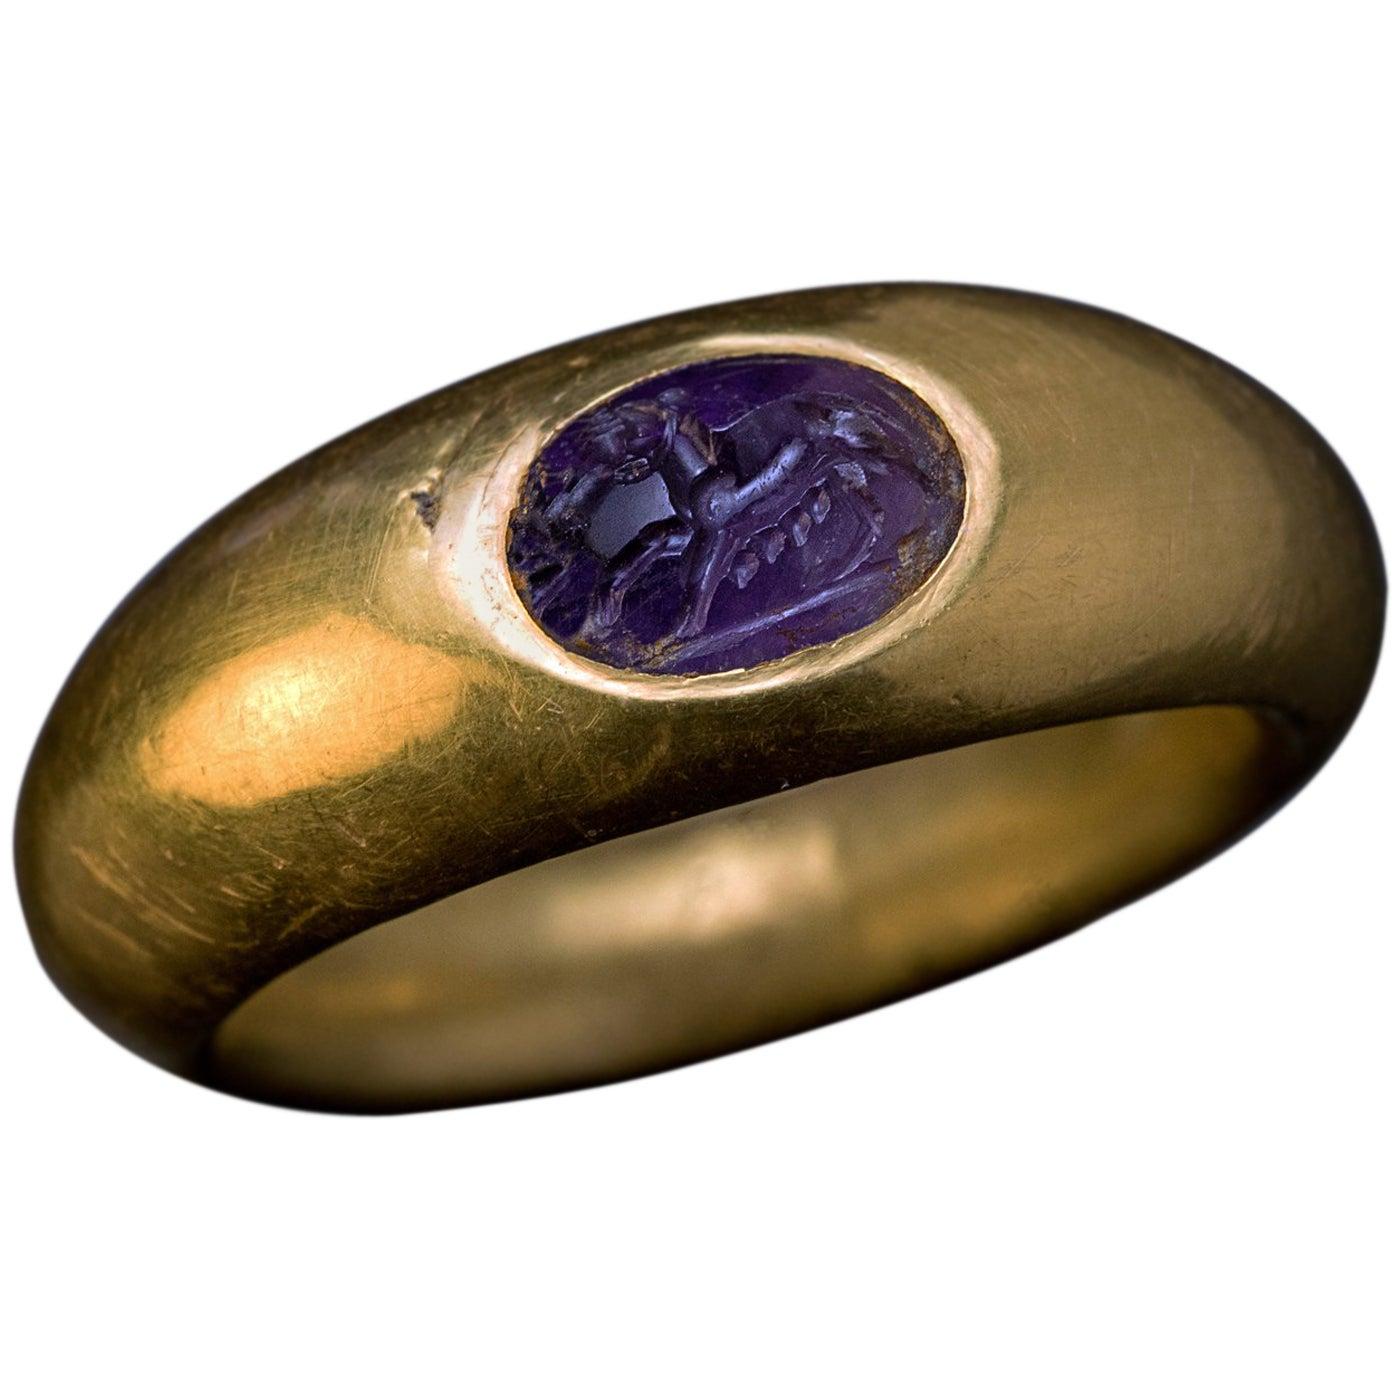 Ancient Roman Amethyst Intaglio Gold Ring